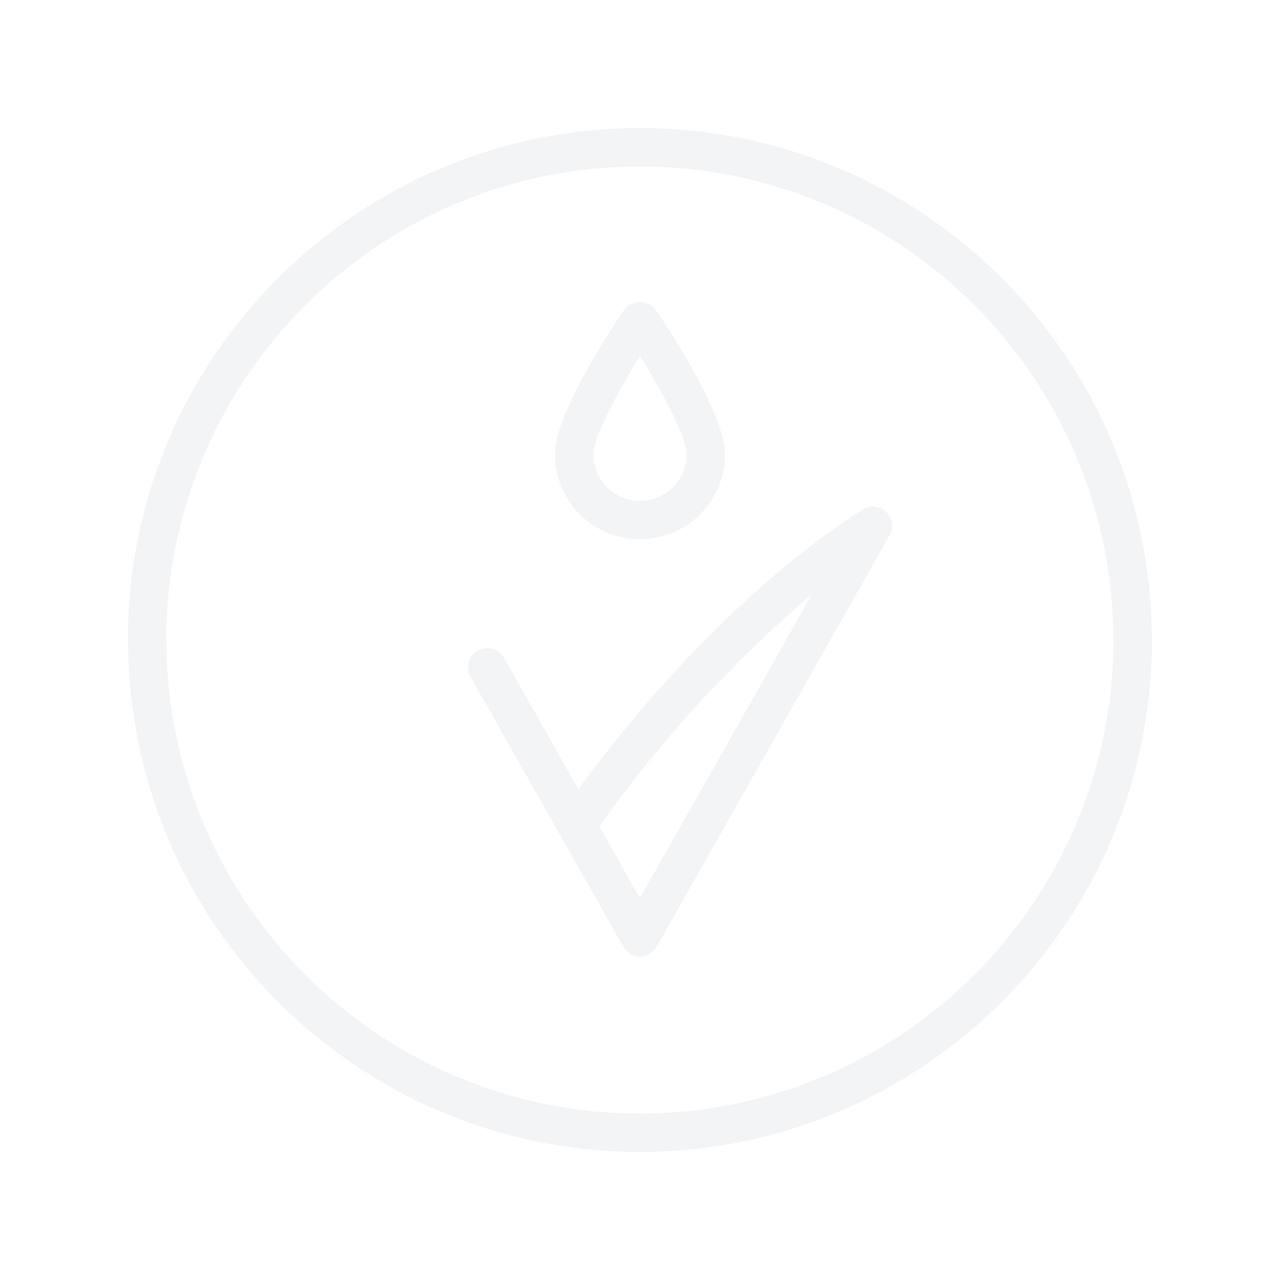 EYLURE Texture Lashes No.150